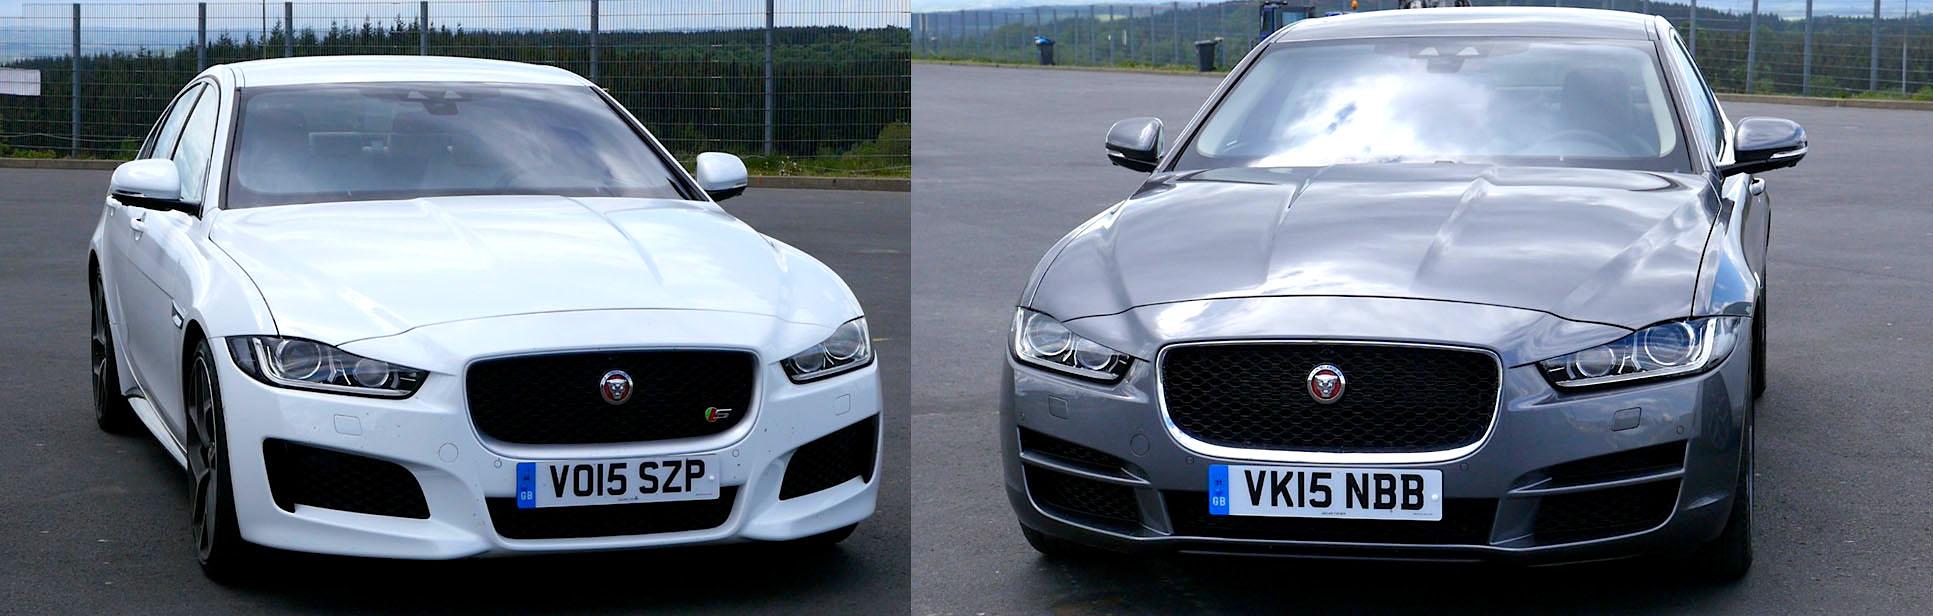 JaguarXE_S-vs-20dPortfolio